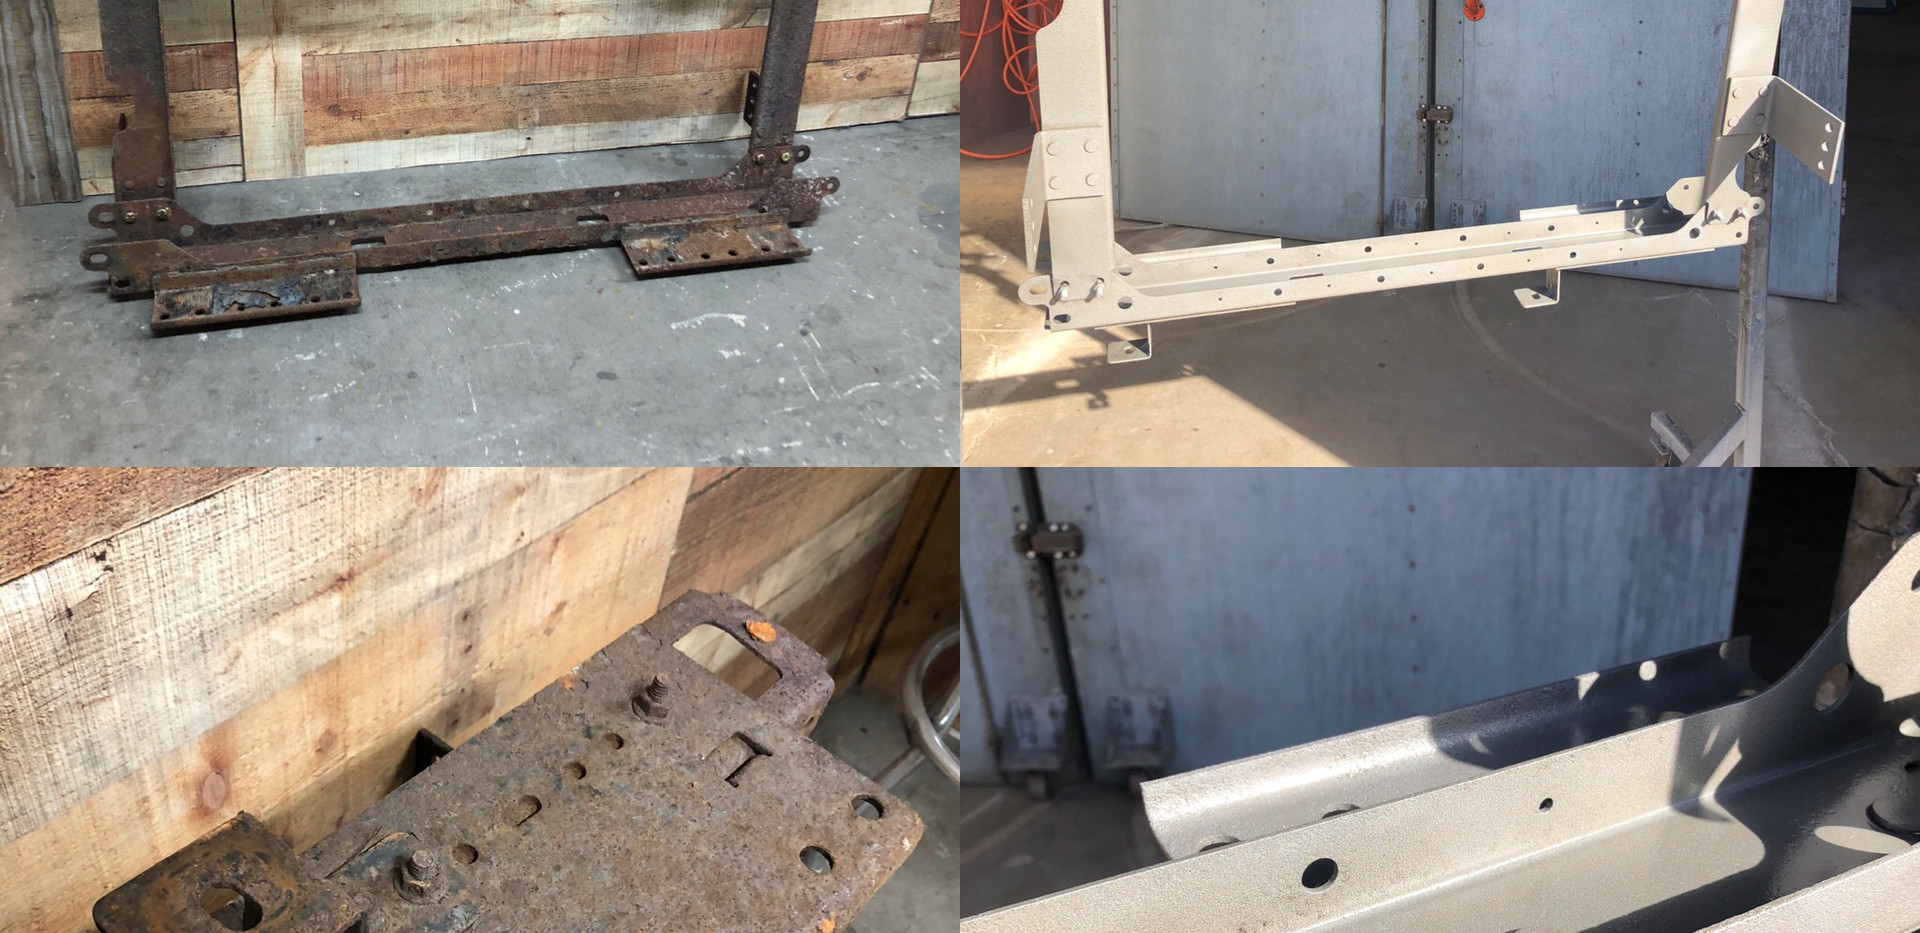 Truck Steel Repair with Powdercoat